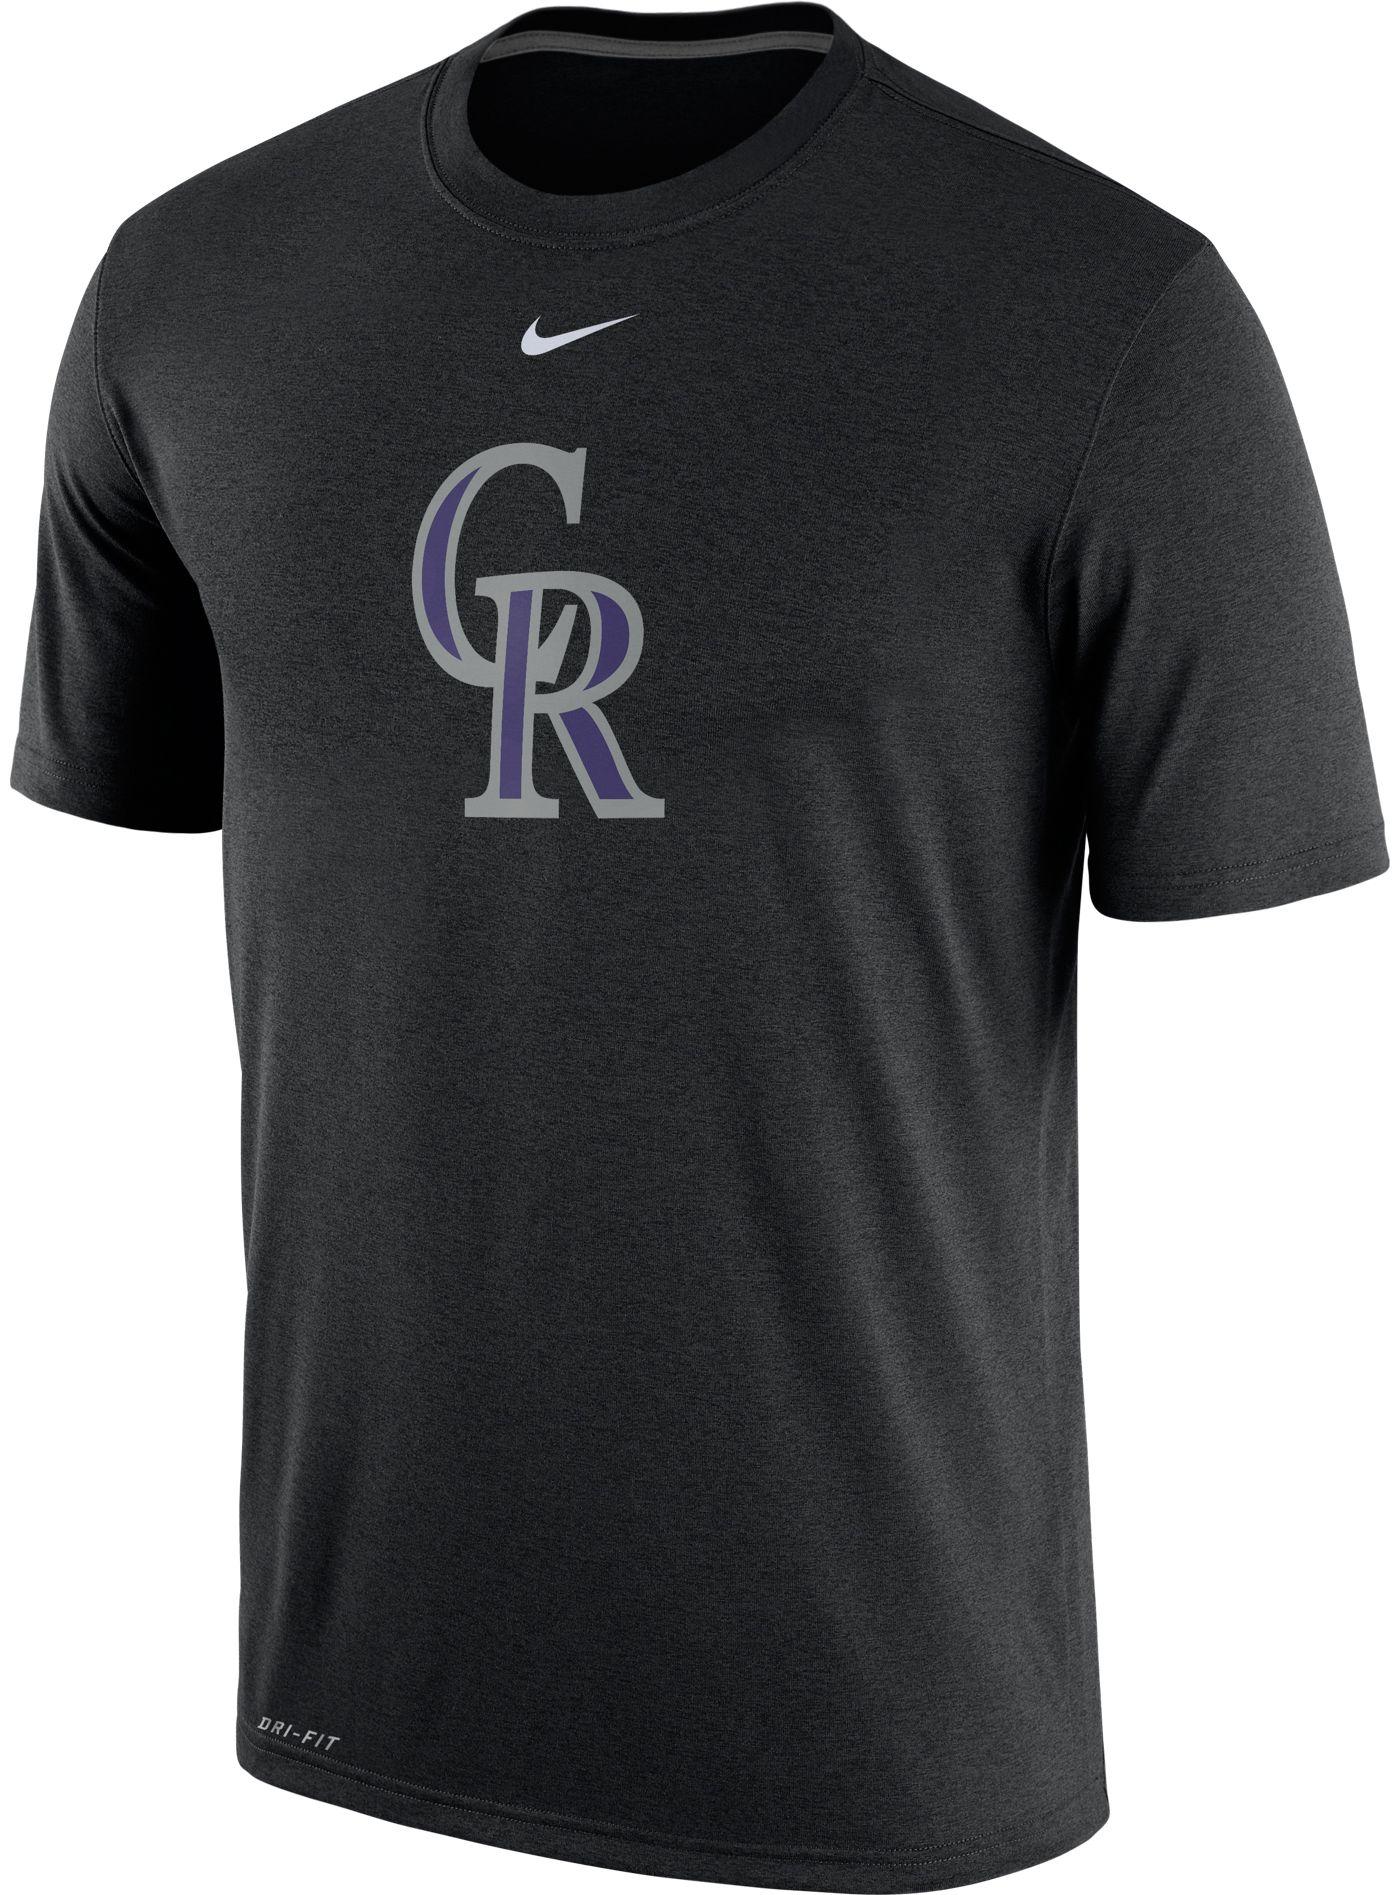 Nike Men's Colorado Rockies Dri-FIT Legend T-Shirt